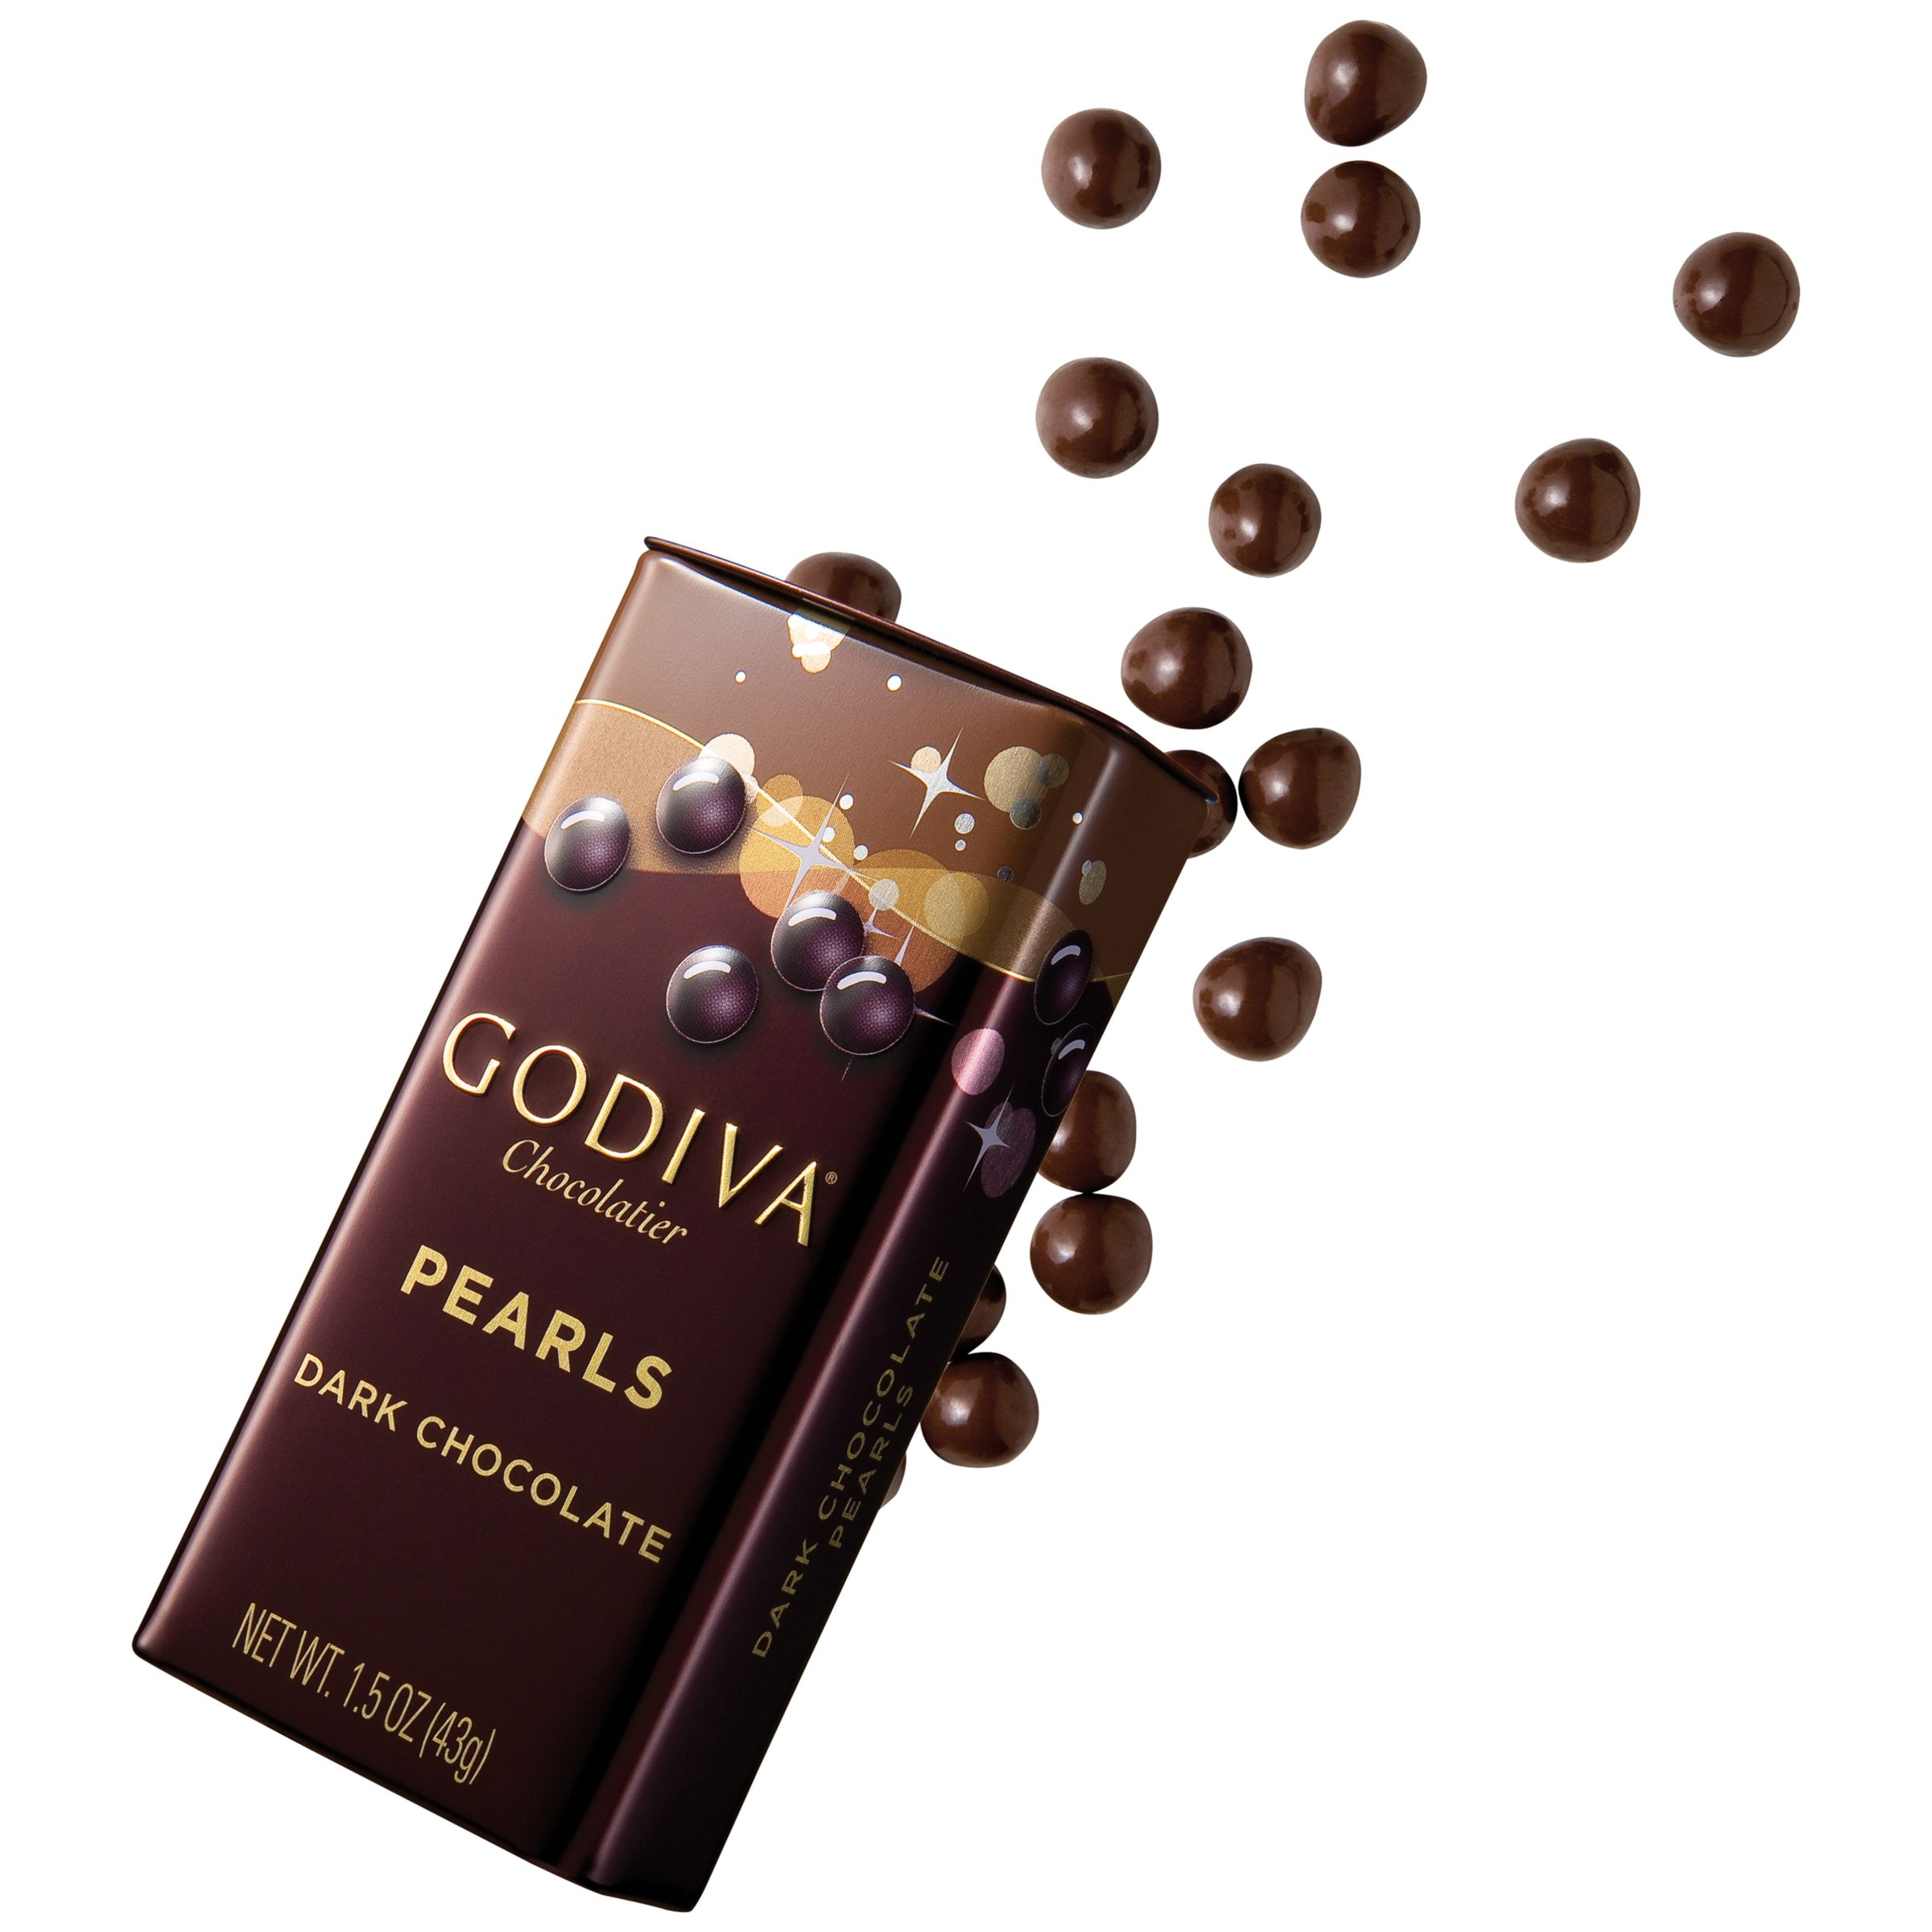 Godiva Godiva Dark Chocolate Pearls In A Tin, 43g